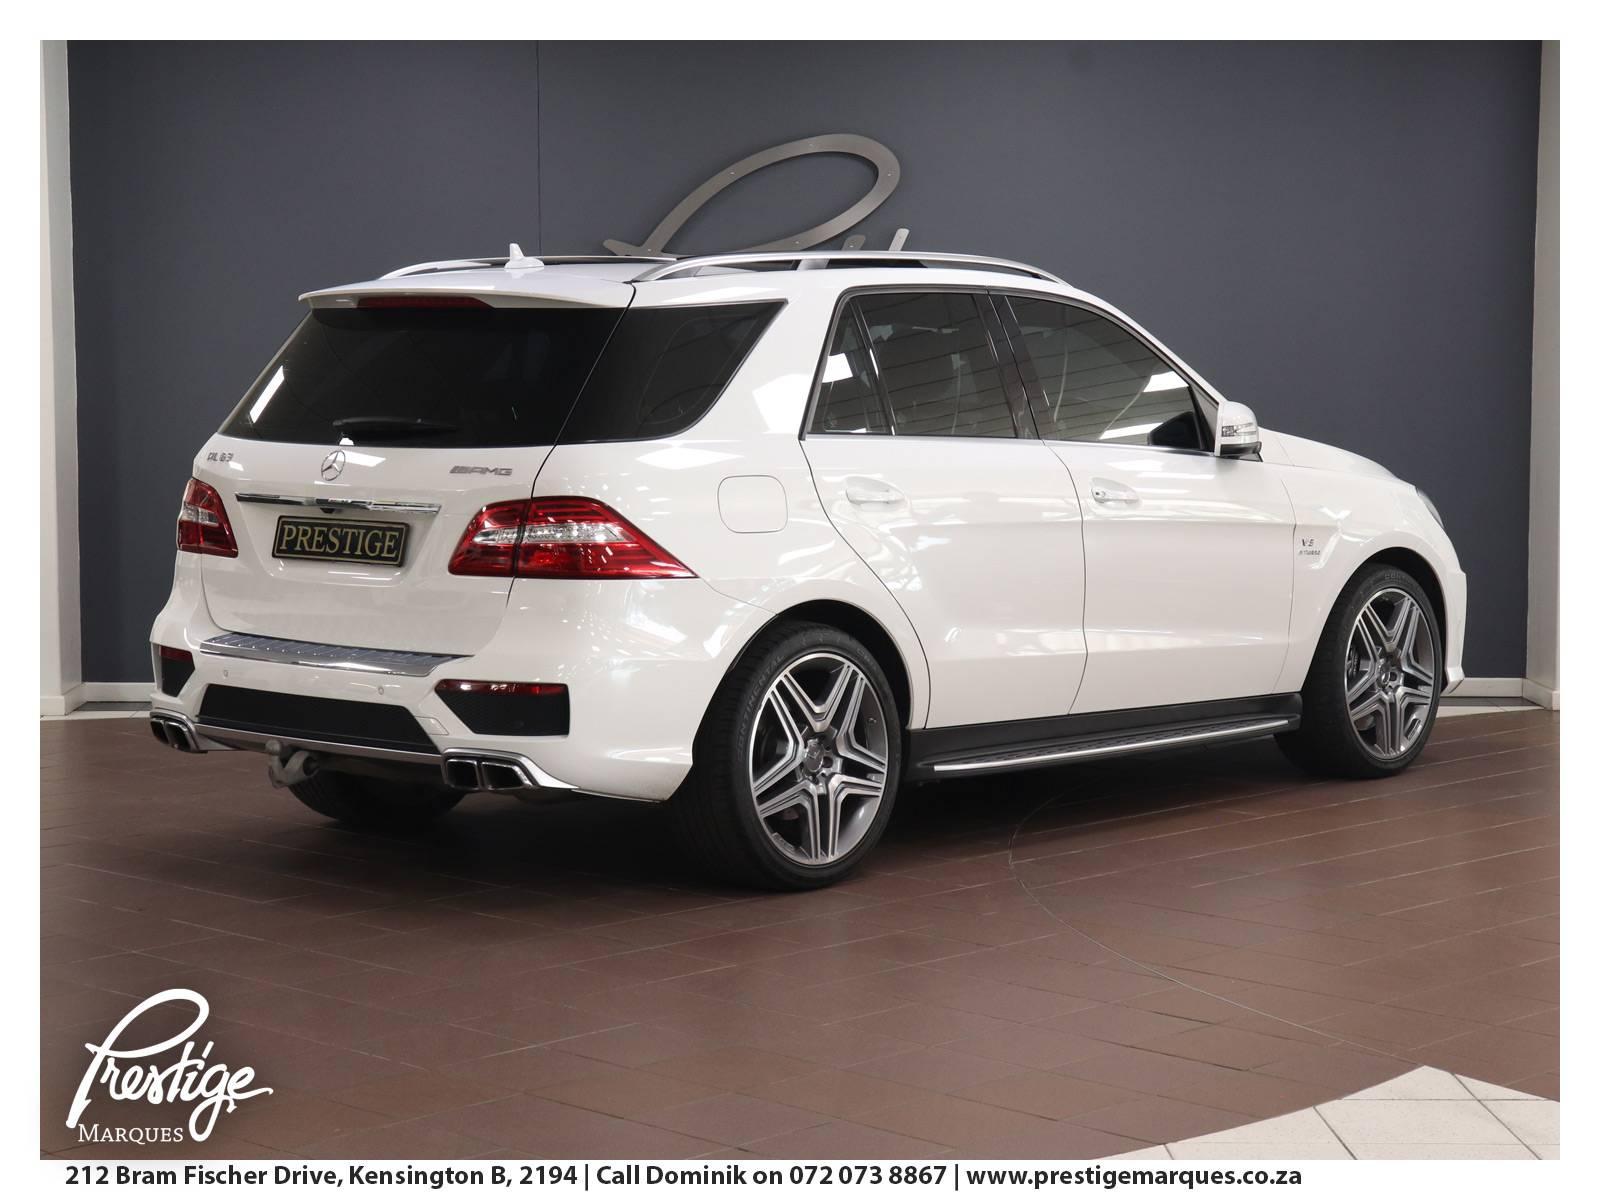 2015-Mercedes-Benz-ML63-AMG-Prestige-Marques-Randburg-Sandton-3